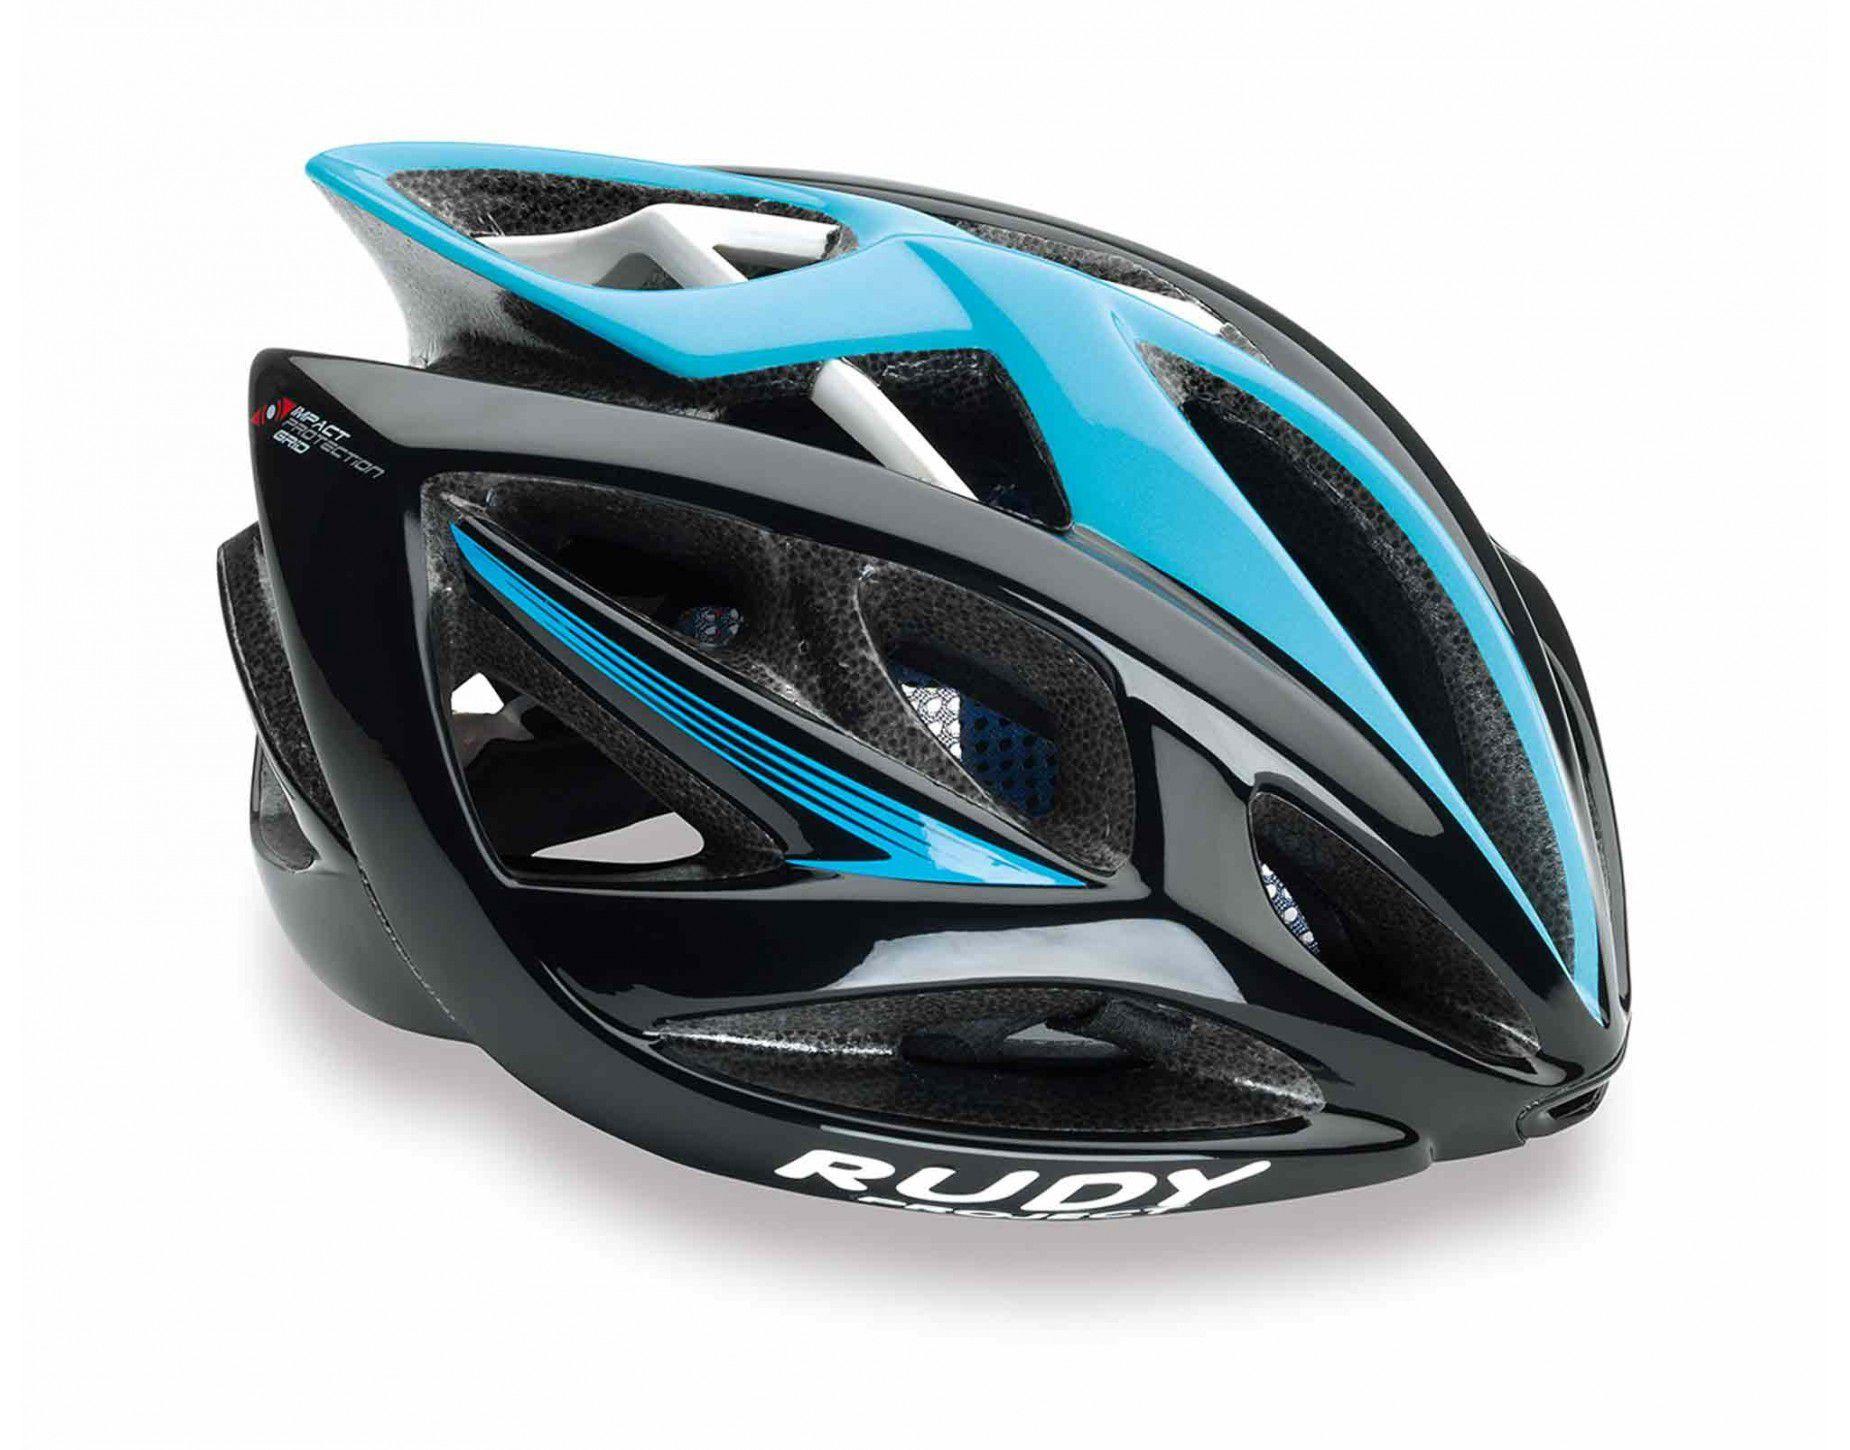 Capacete Bike Rudy Project Airstorm Preto/azul Tam S-m 54-58